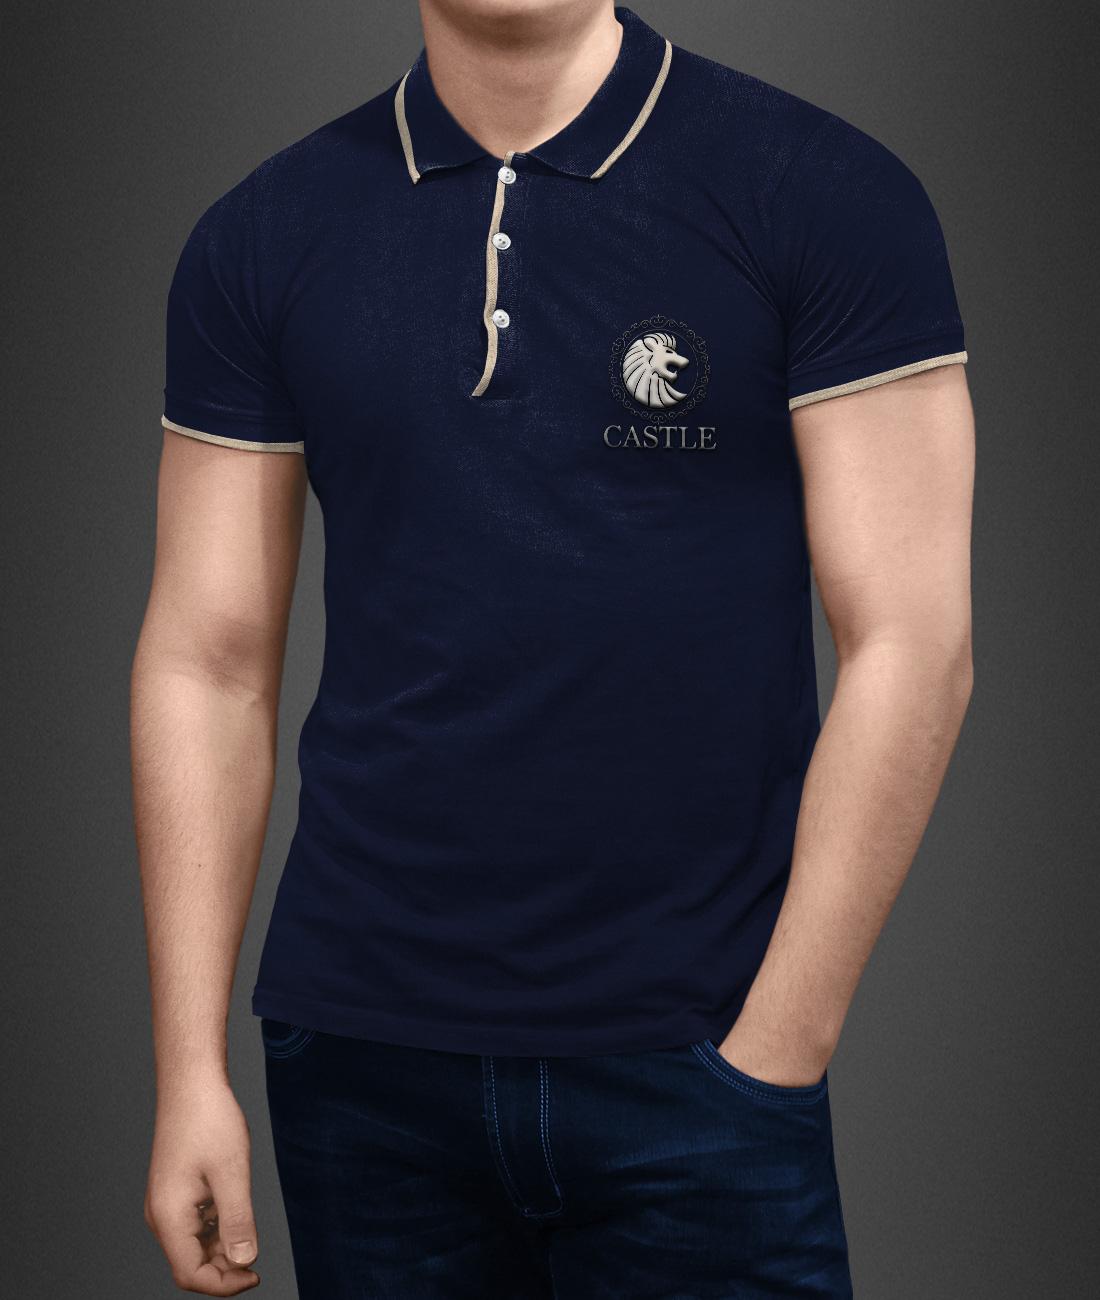 male polo shirt employee design